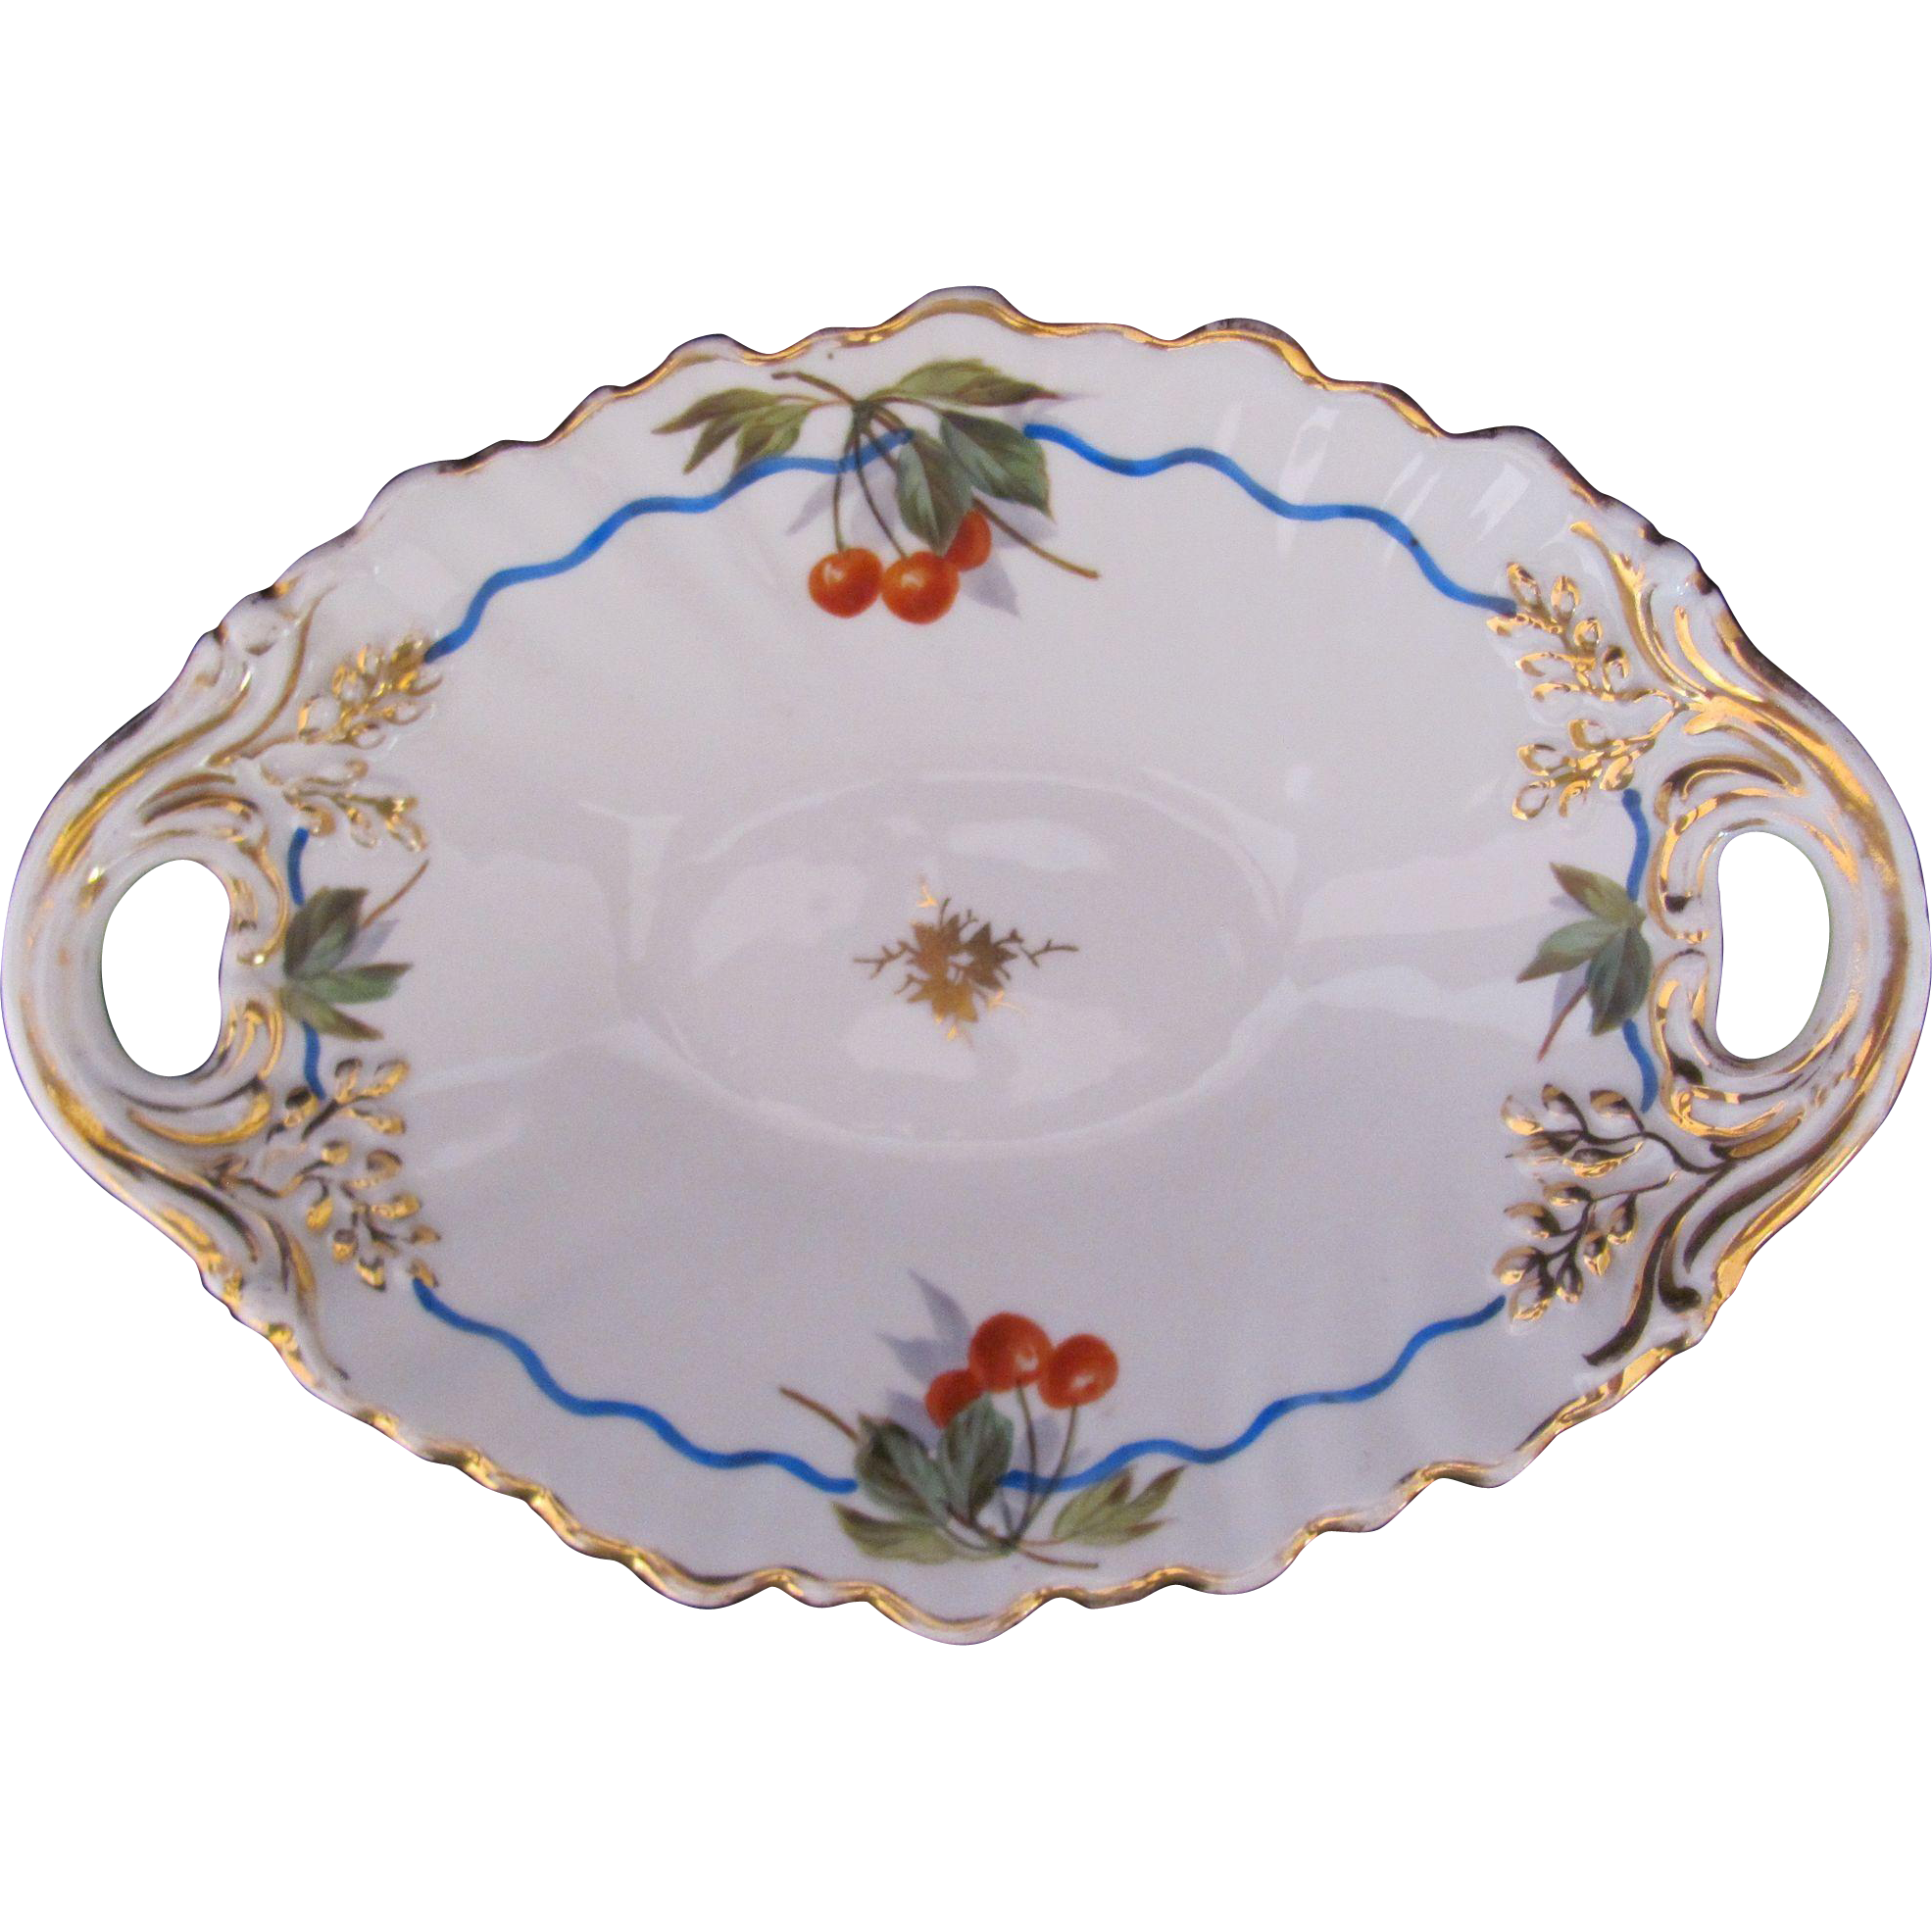 Antique KPM Oval Dish Bowl c.1840-1895